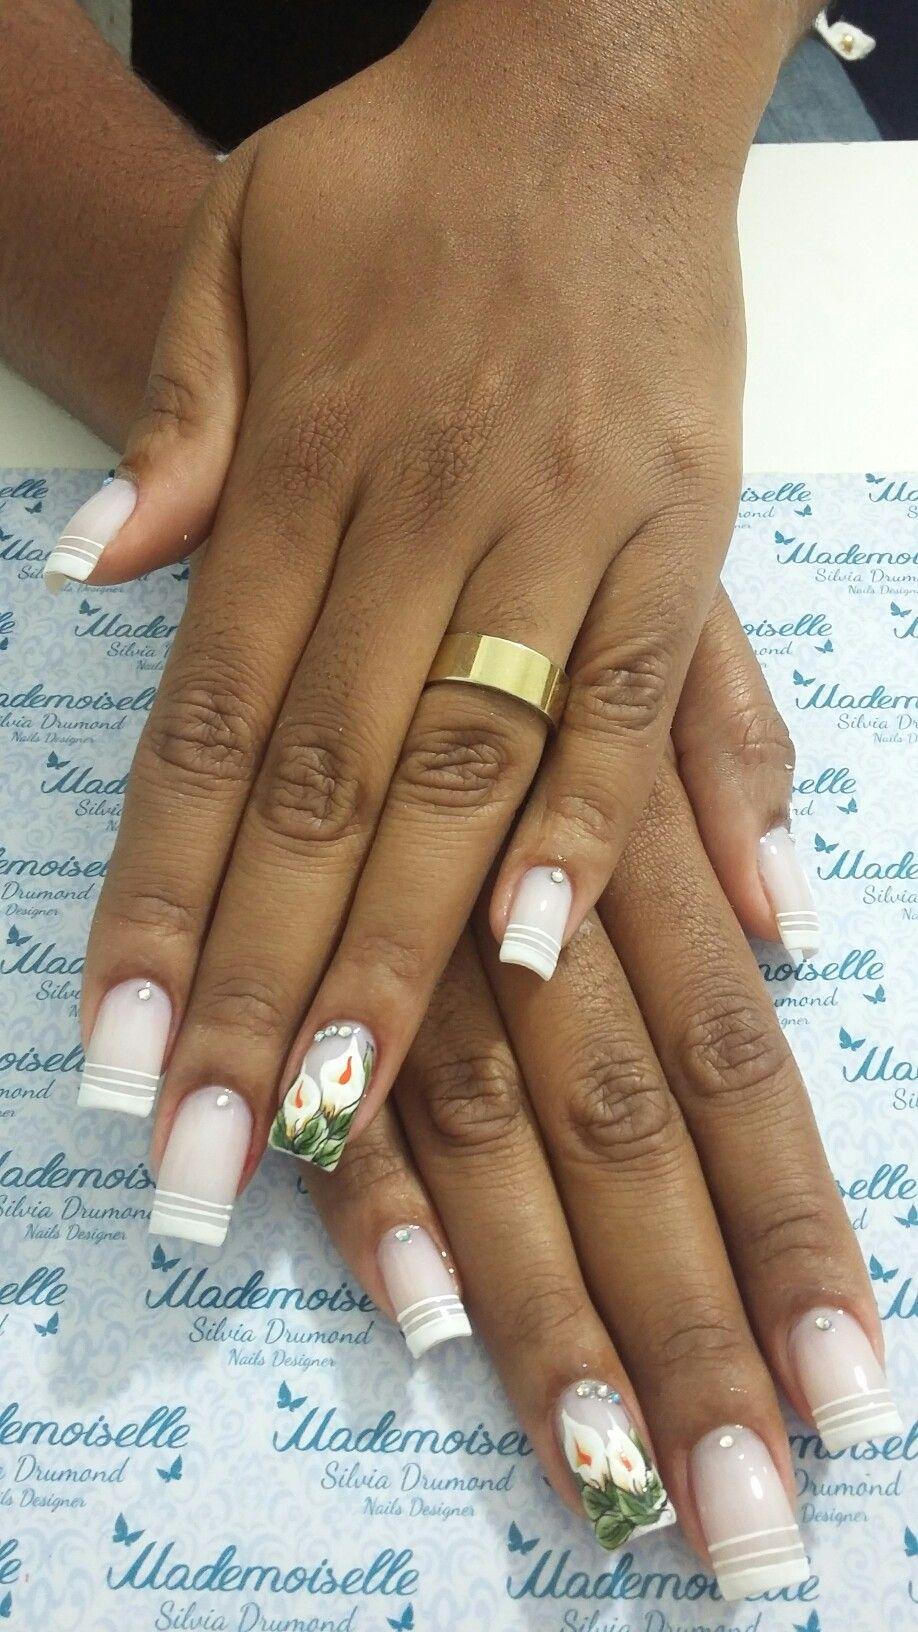 #nails #nailart #nailslove #meustrabalhos #amooquefaço #Mademoiselleespaçodeunhas #silviadrumond